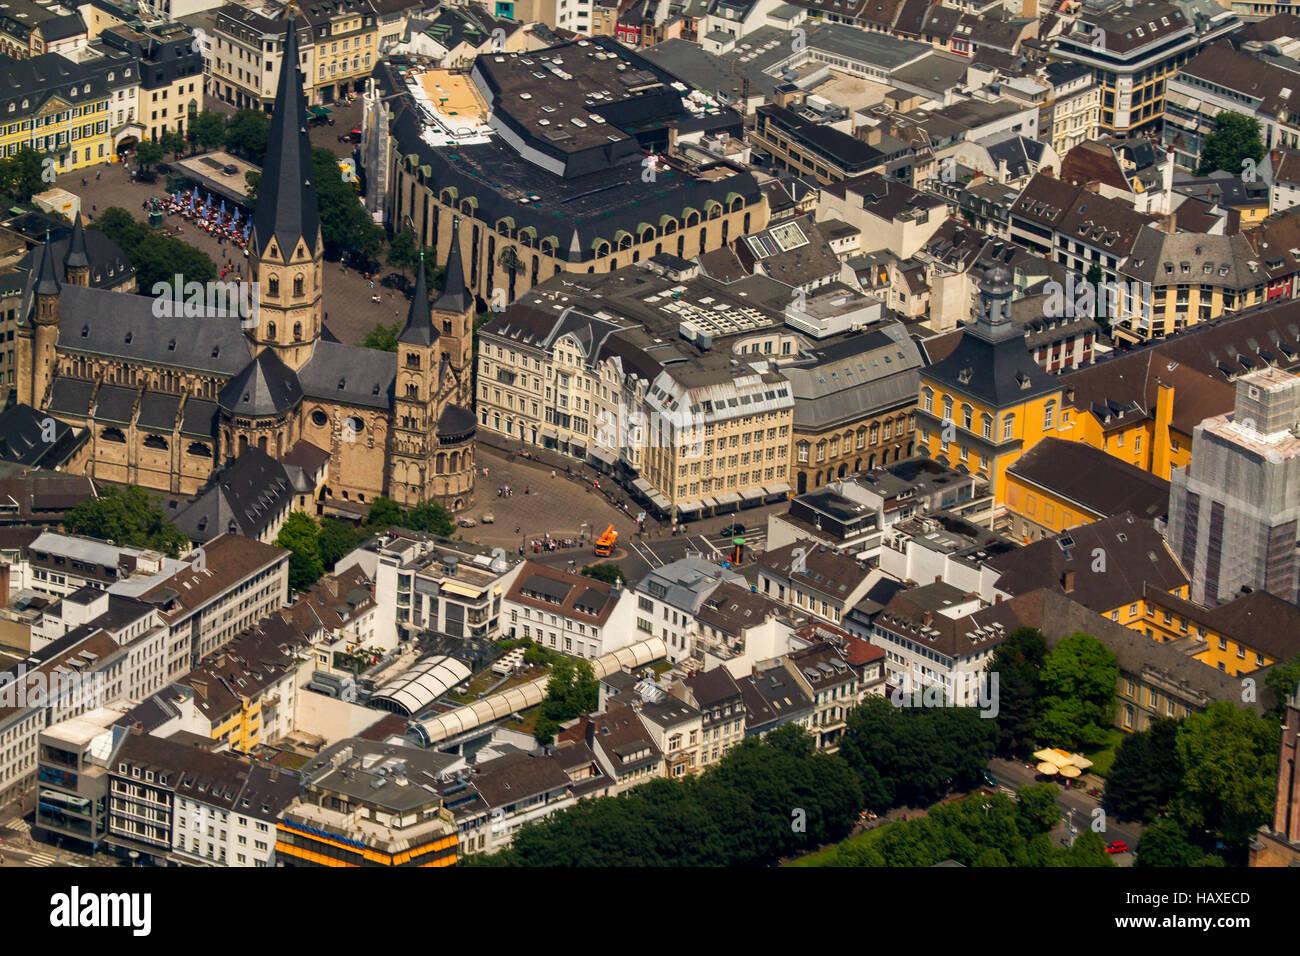 City of Bonn Germany NRW - Stock Image